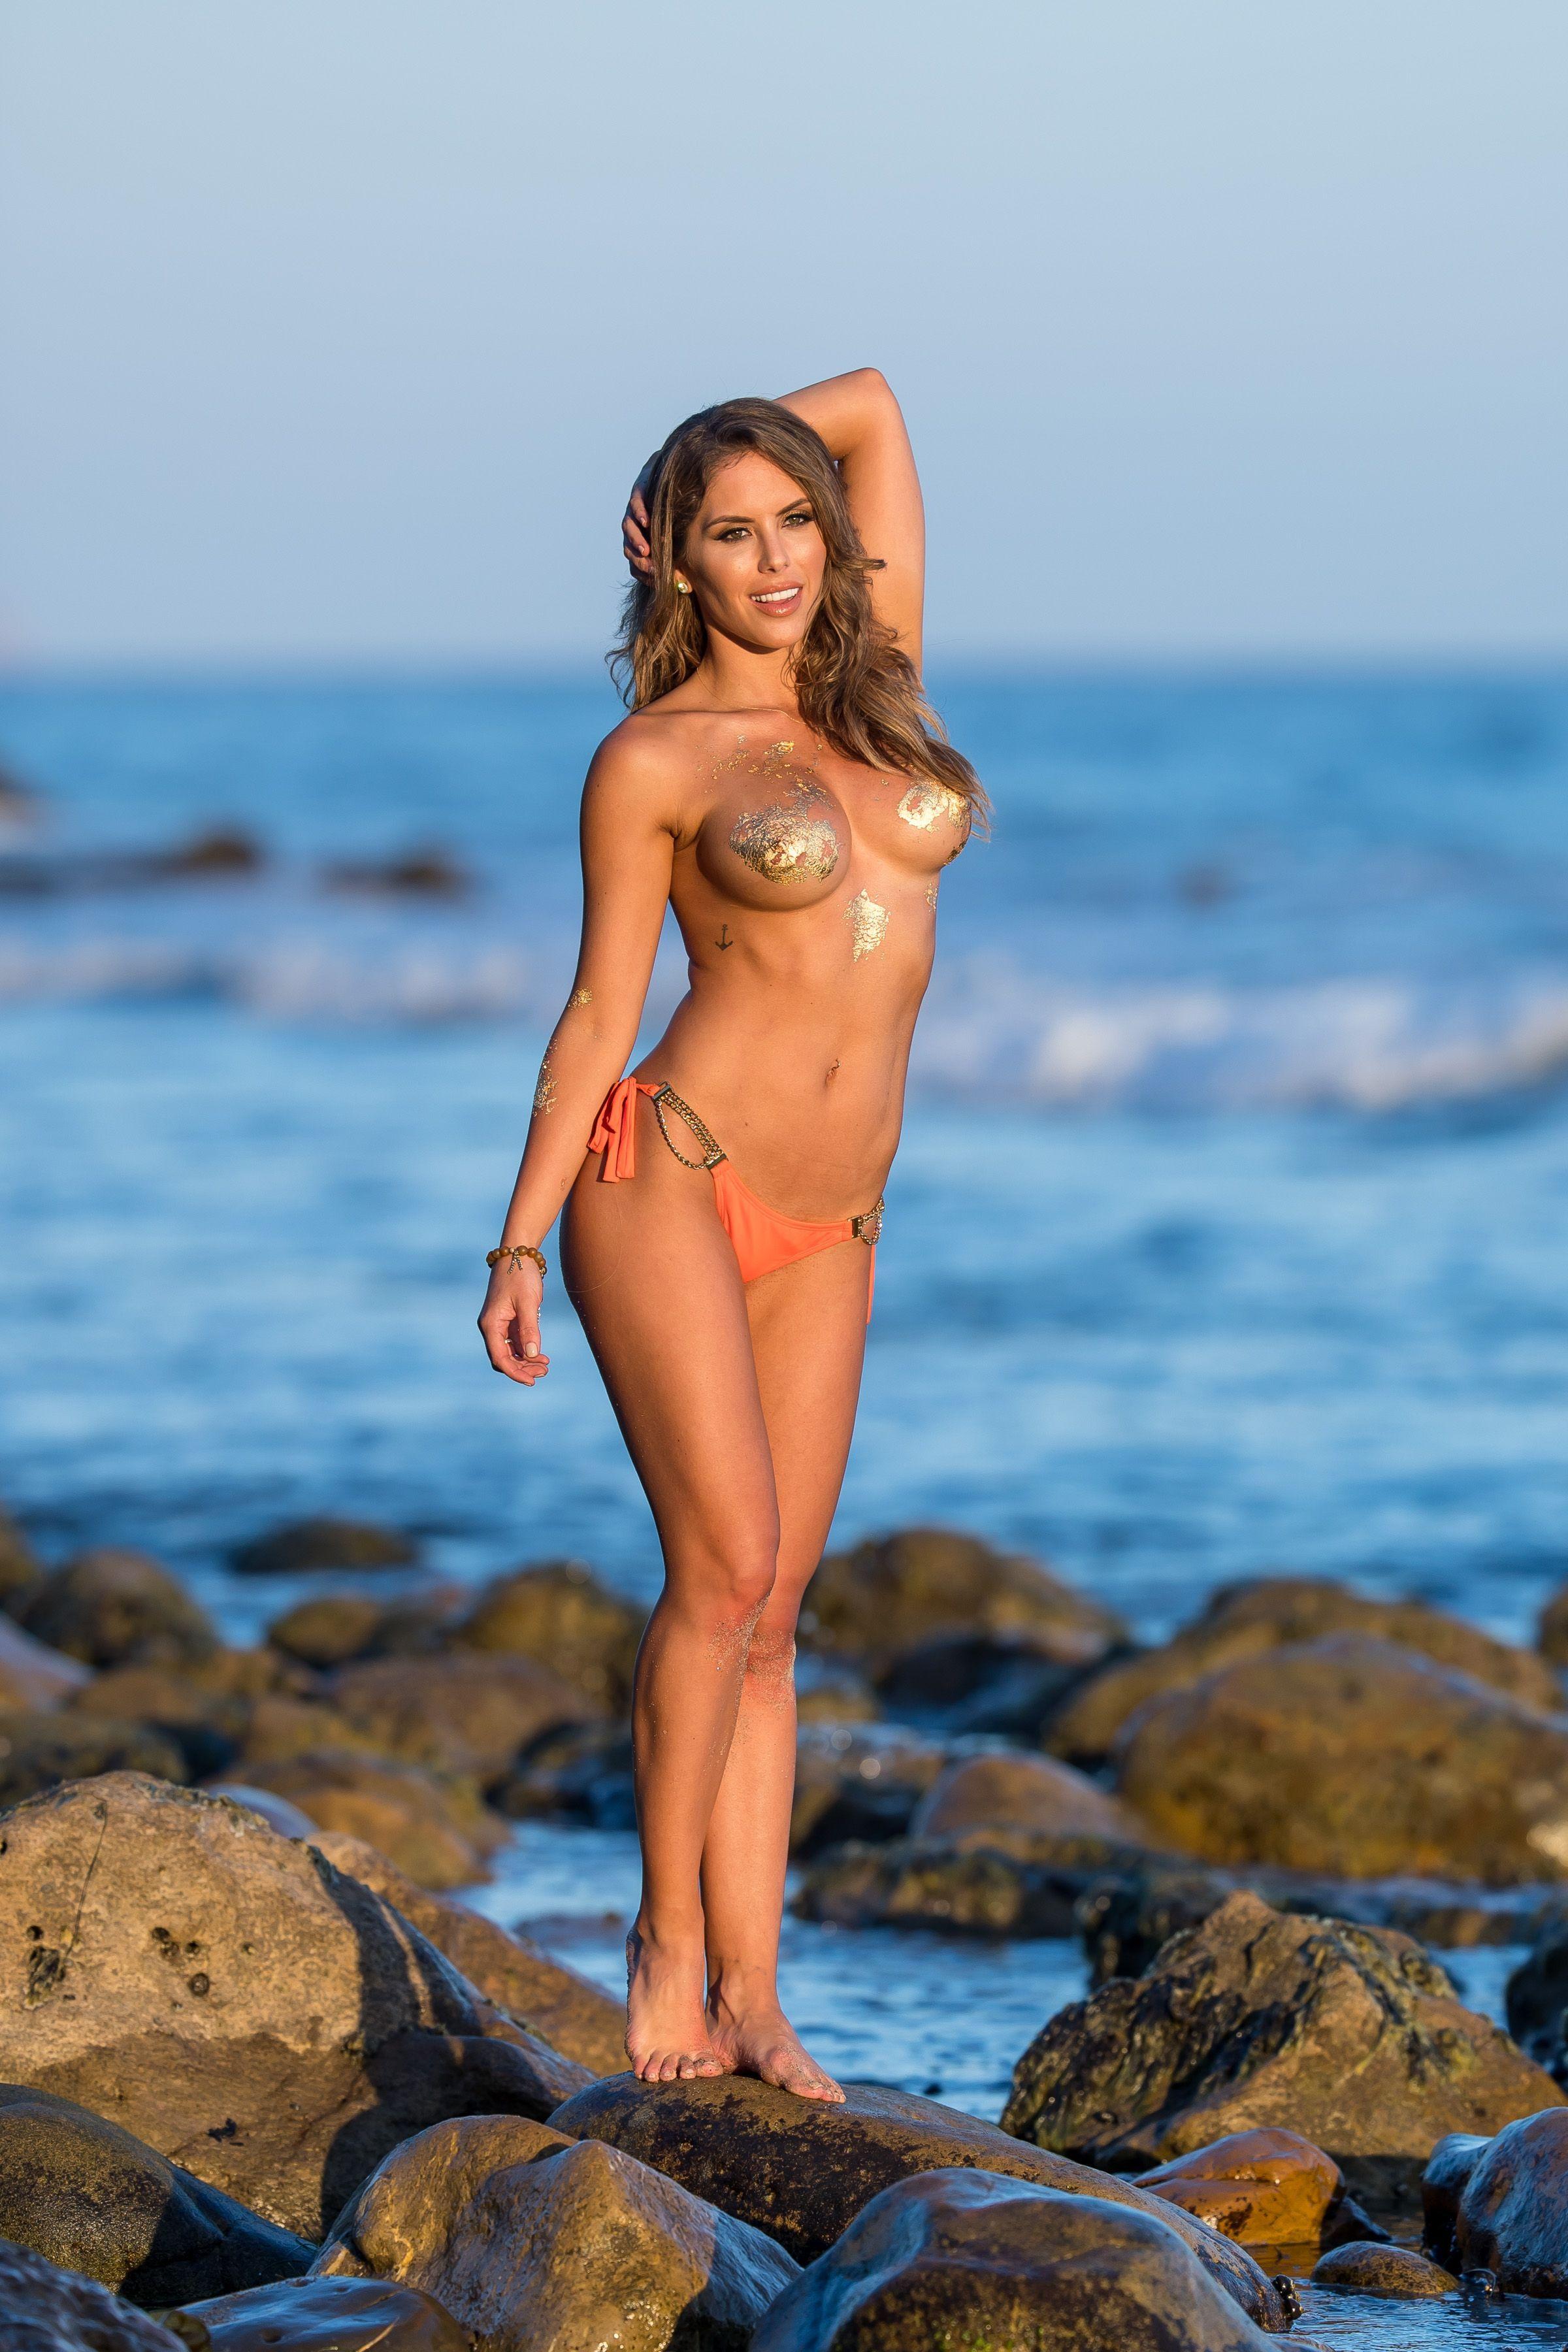 Brittney-Palmer-Sexy-Topless-34-thefappeningblog.com_.jpg